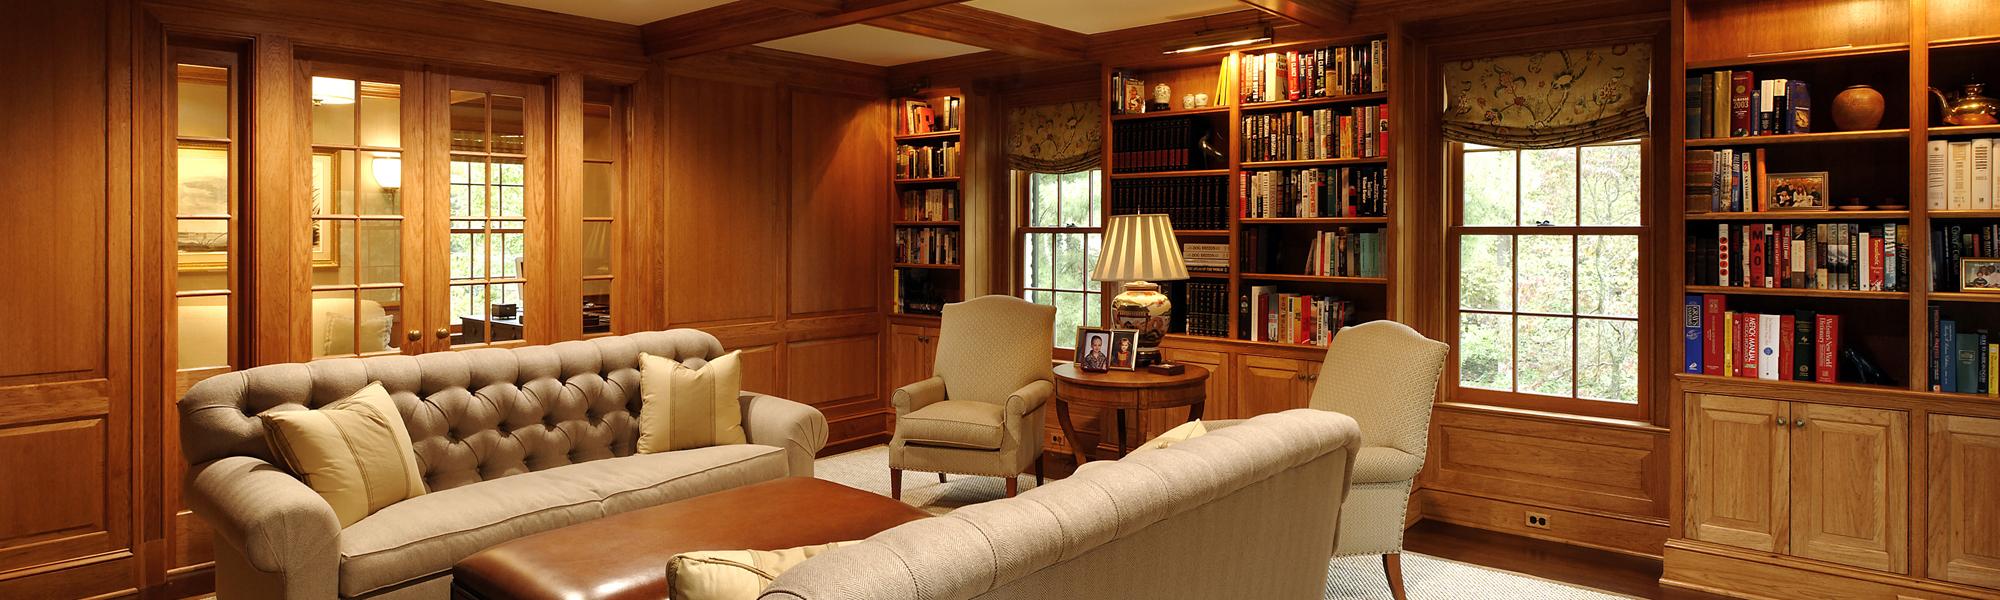 reading room luxury remodeling luxury renovations design rh bowa com